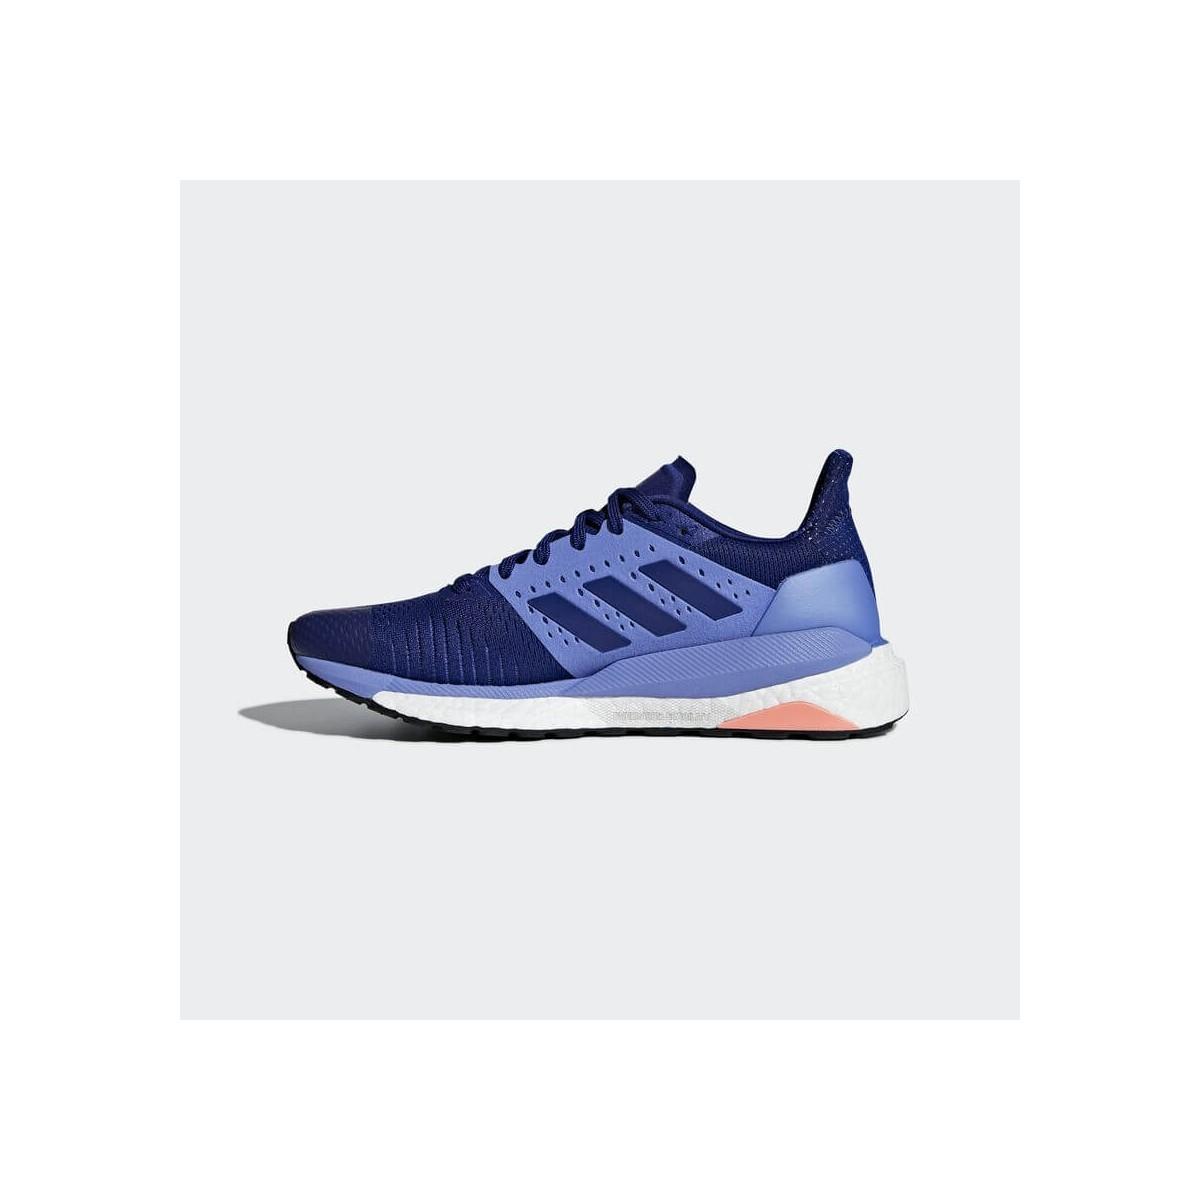 Zapatillas Adidas Solar Glide ST Lima Fluor Blanco Azul PV19 Mujer